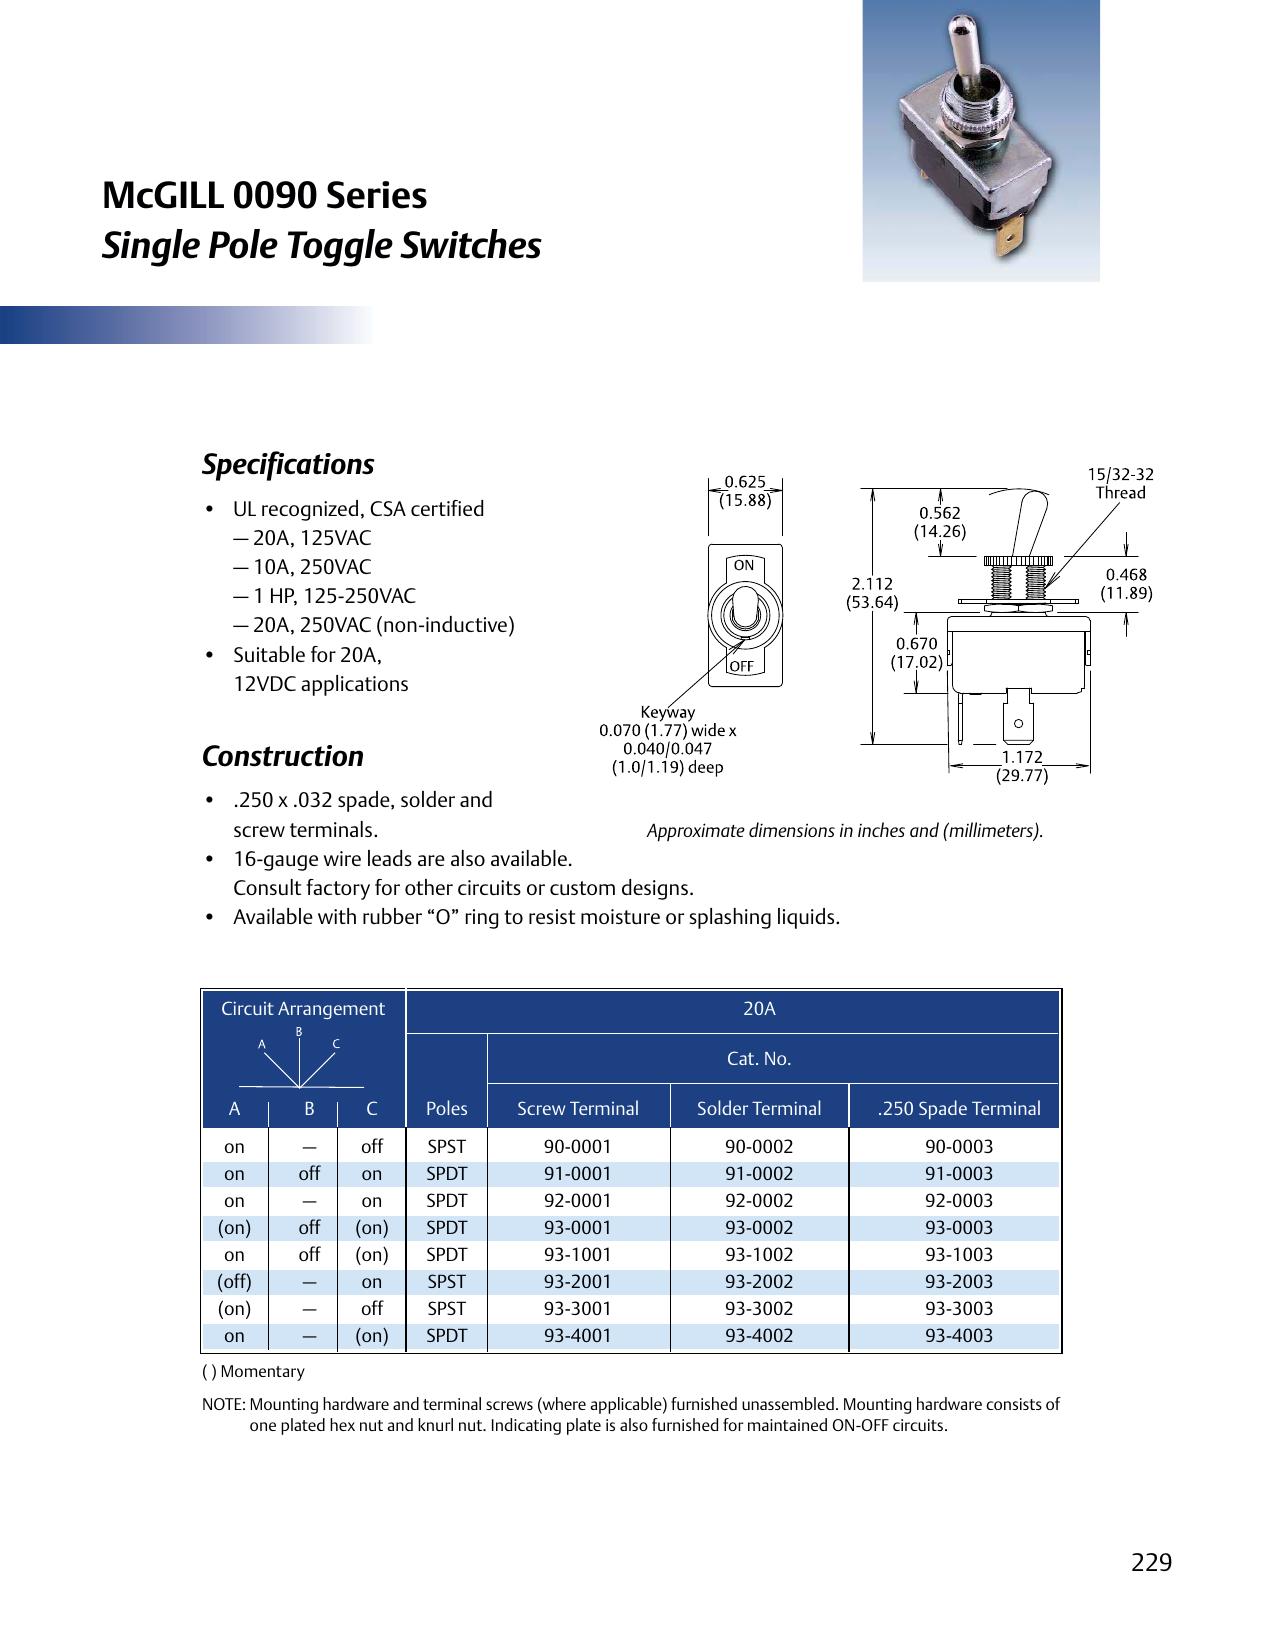 McGILL 0090 Series Single Pole Toggle Switches | manualzz com